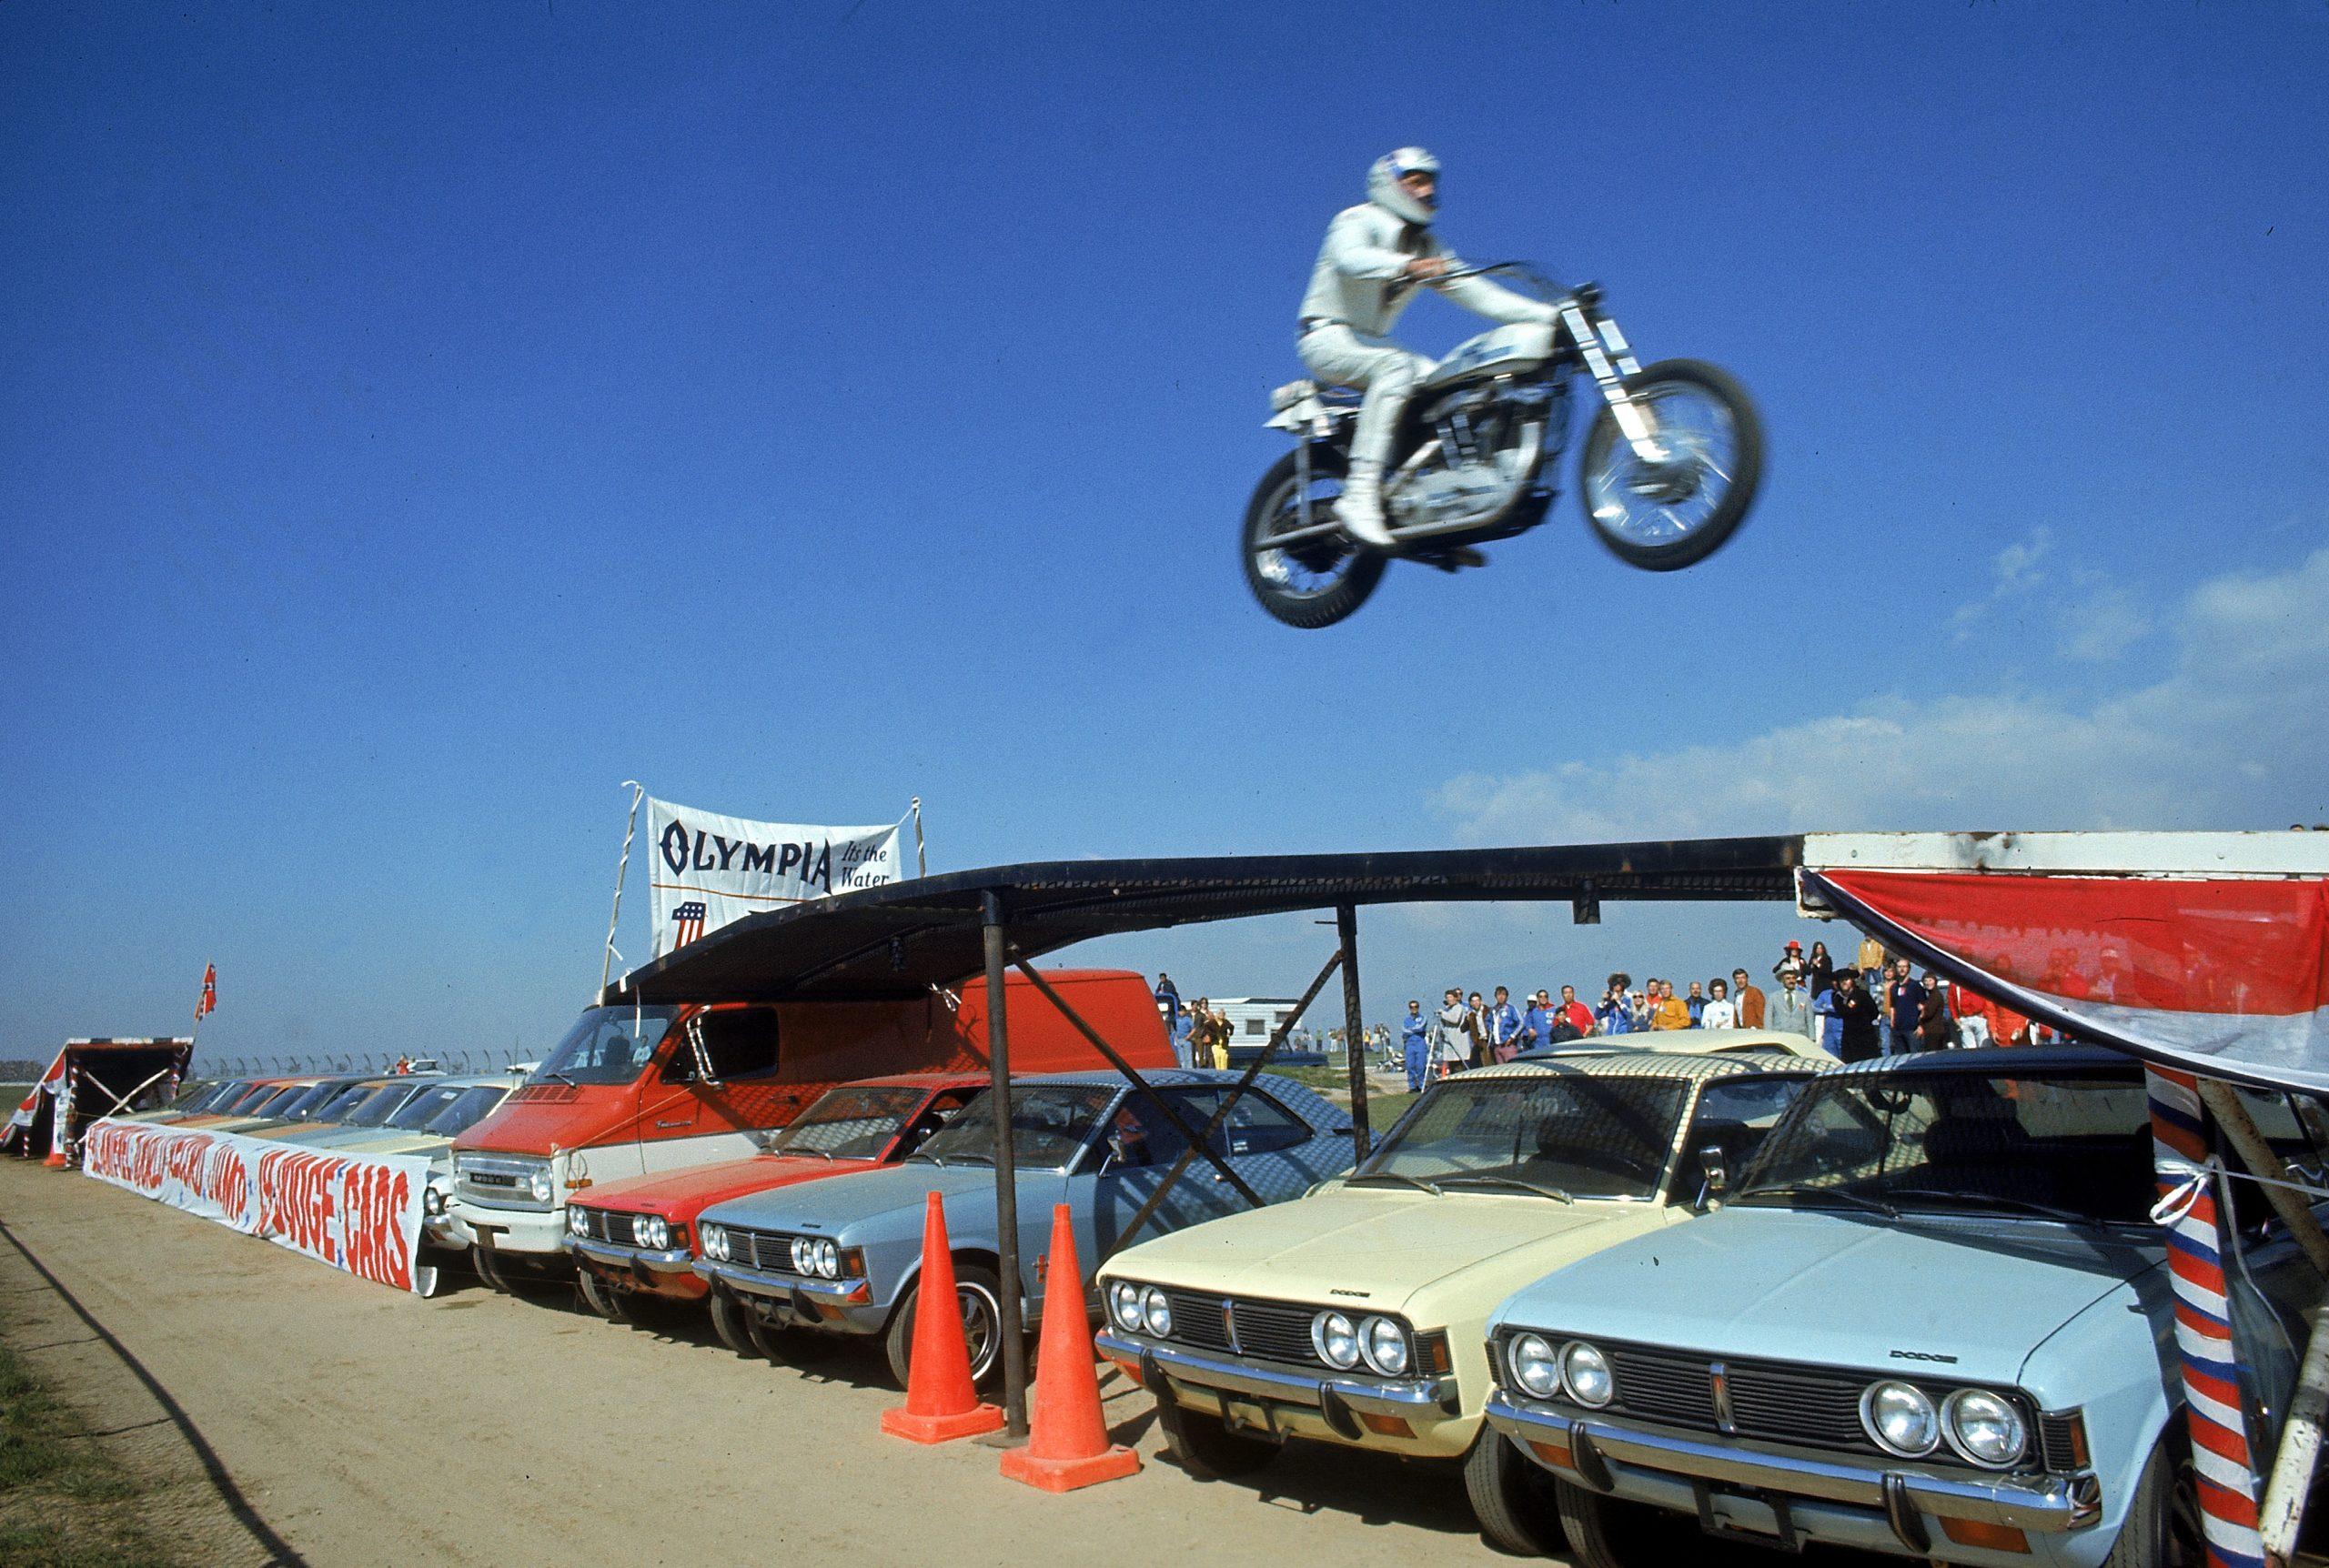 Evel Knievel In Flight